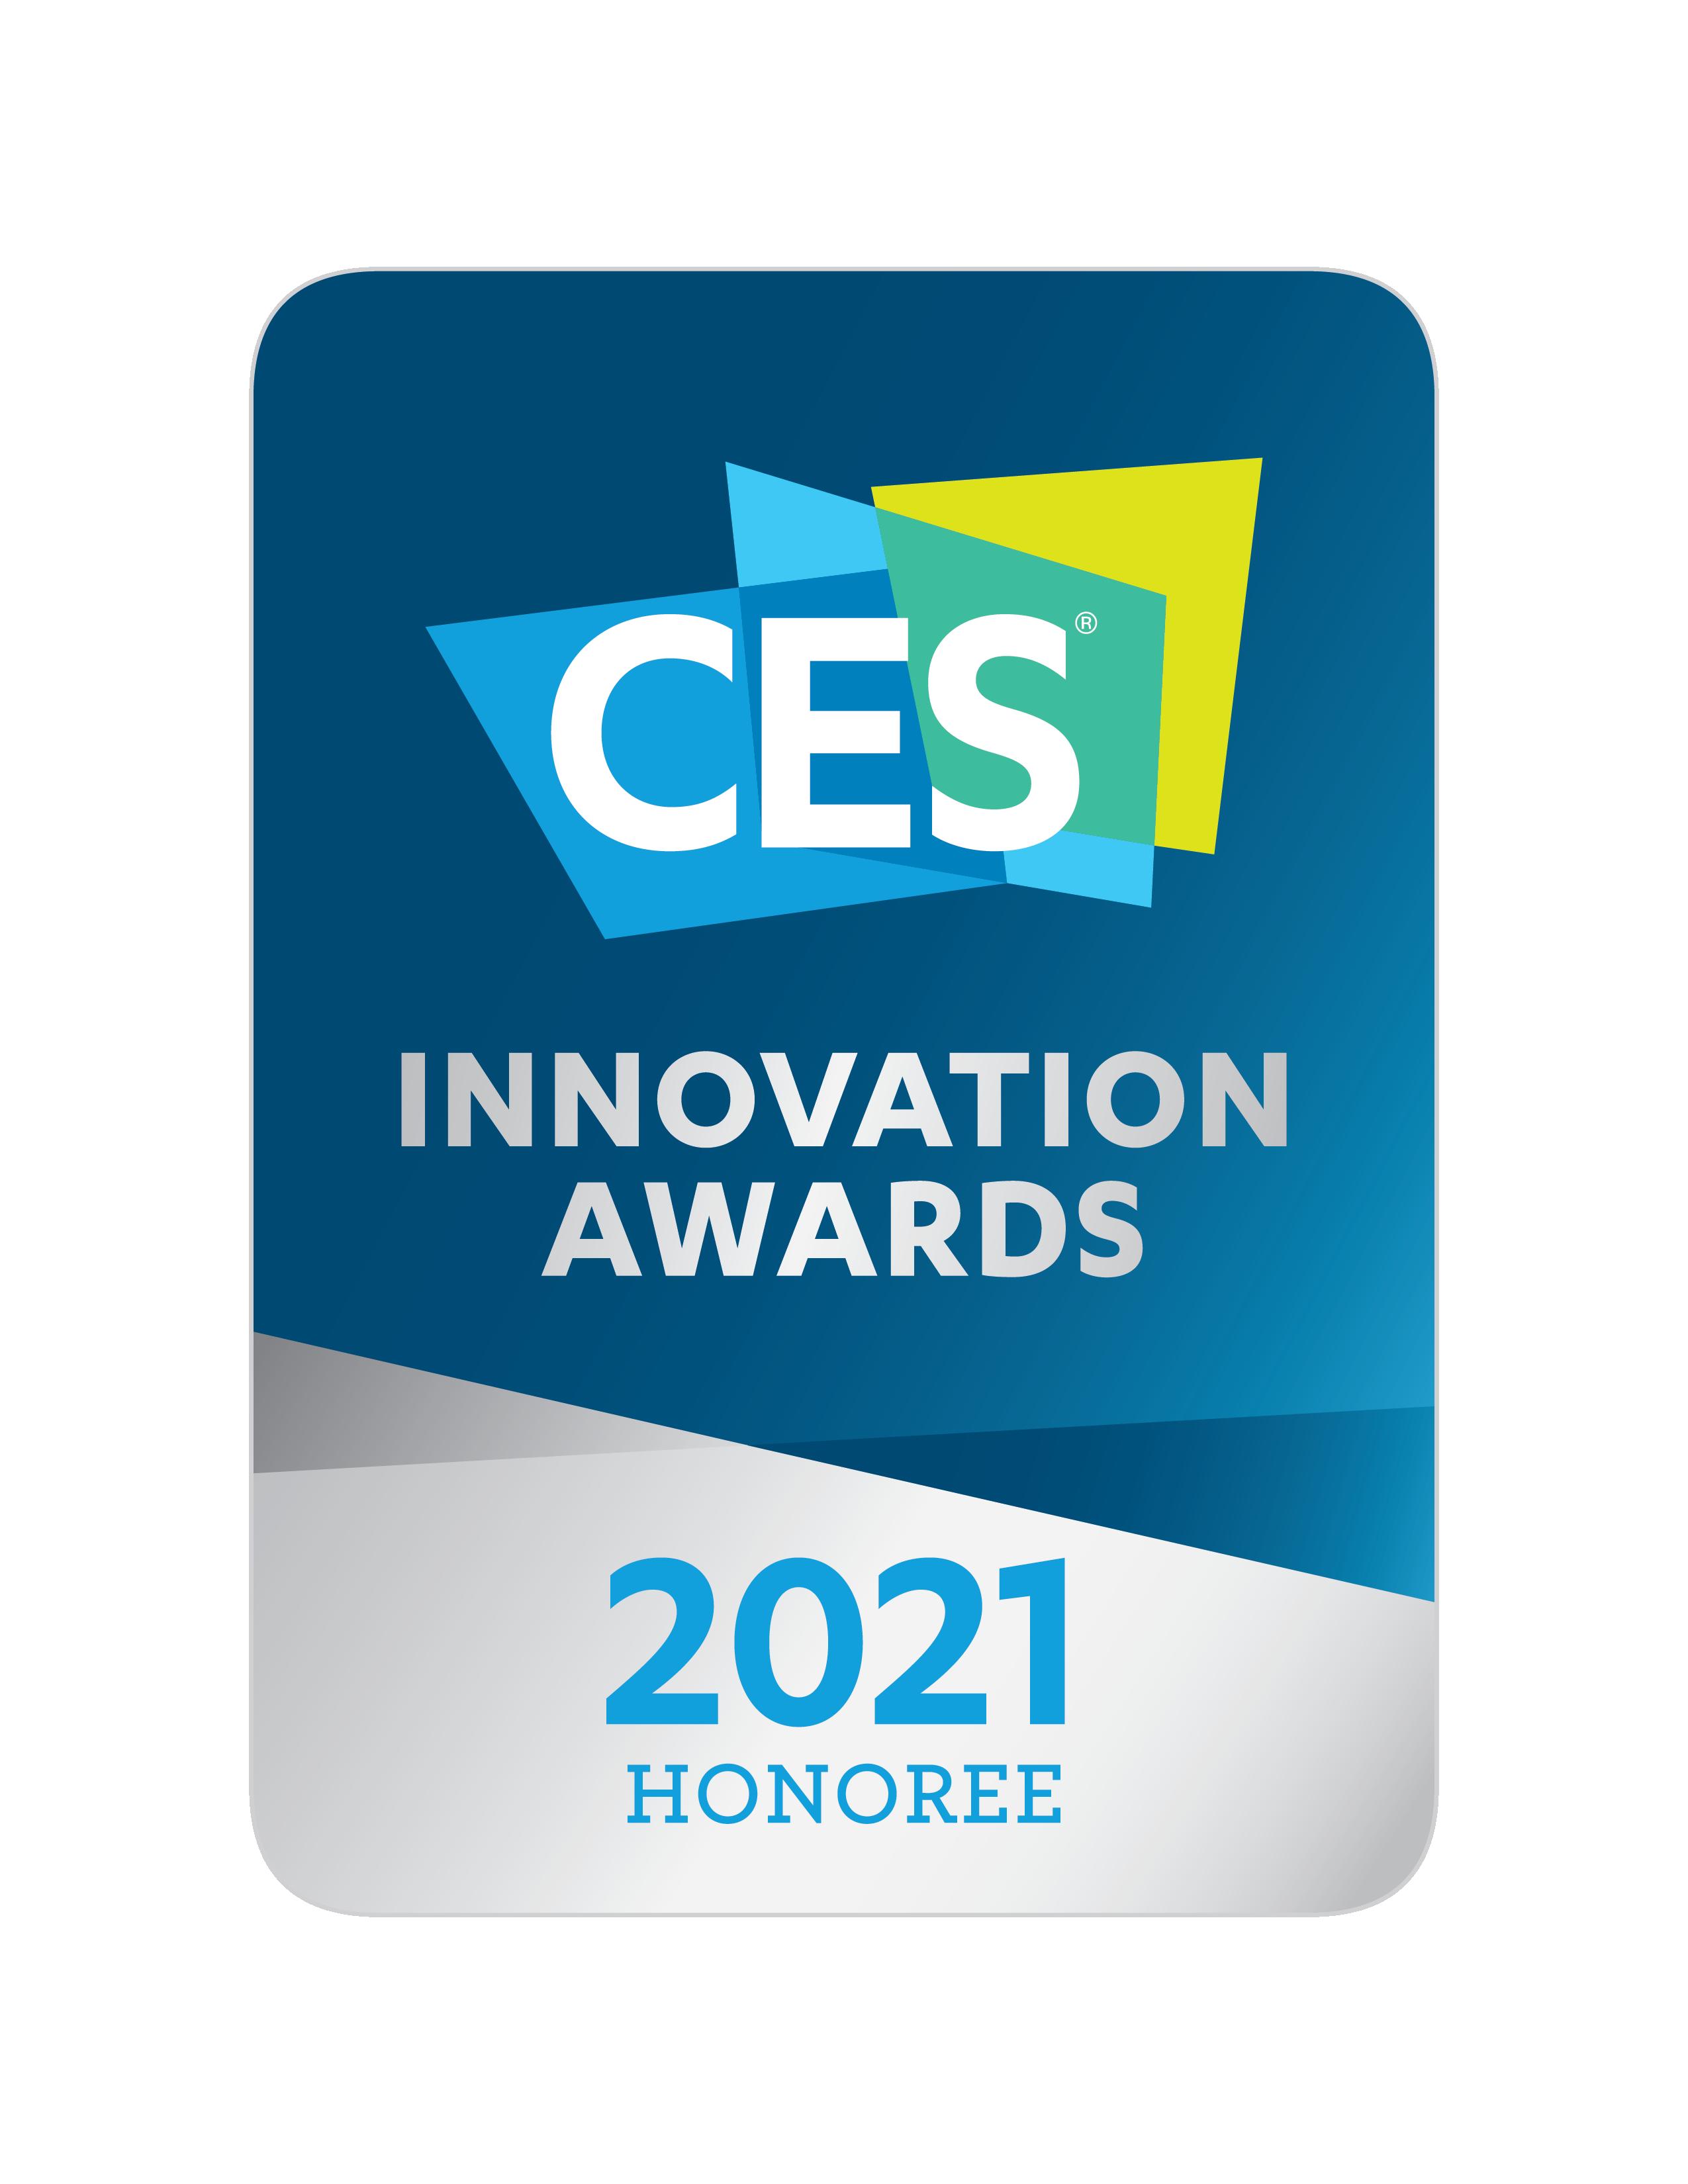 CES 2021 Innovation Awards Logo (1)